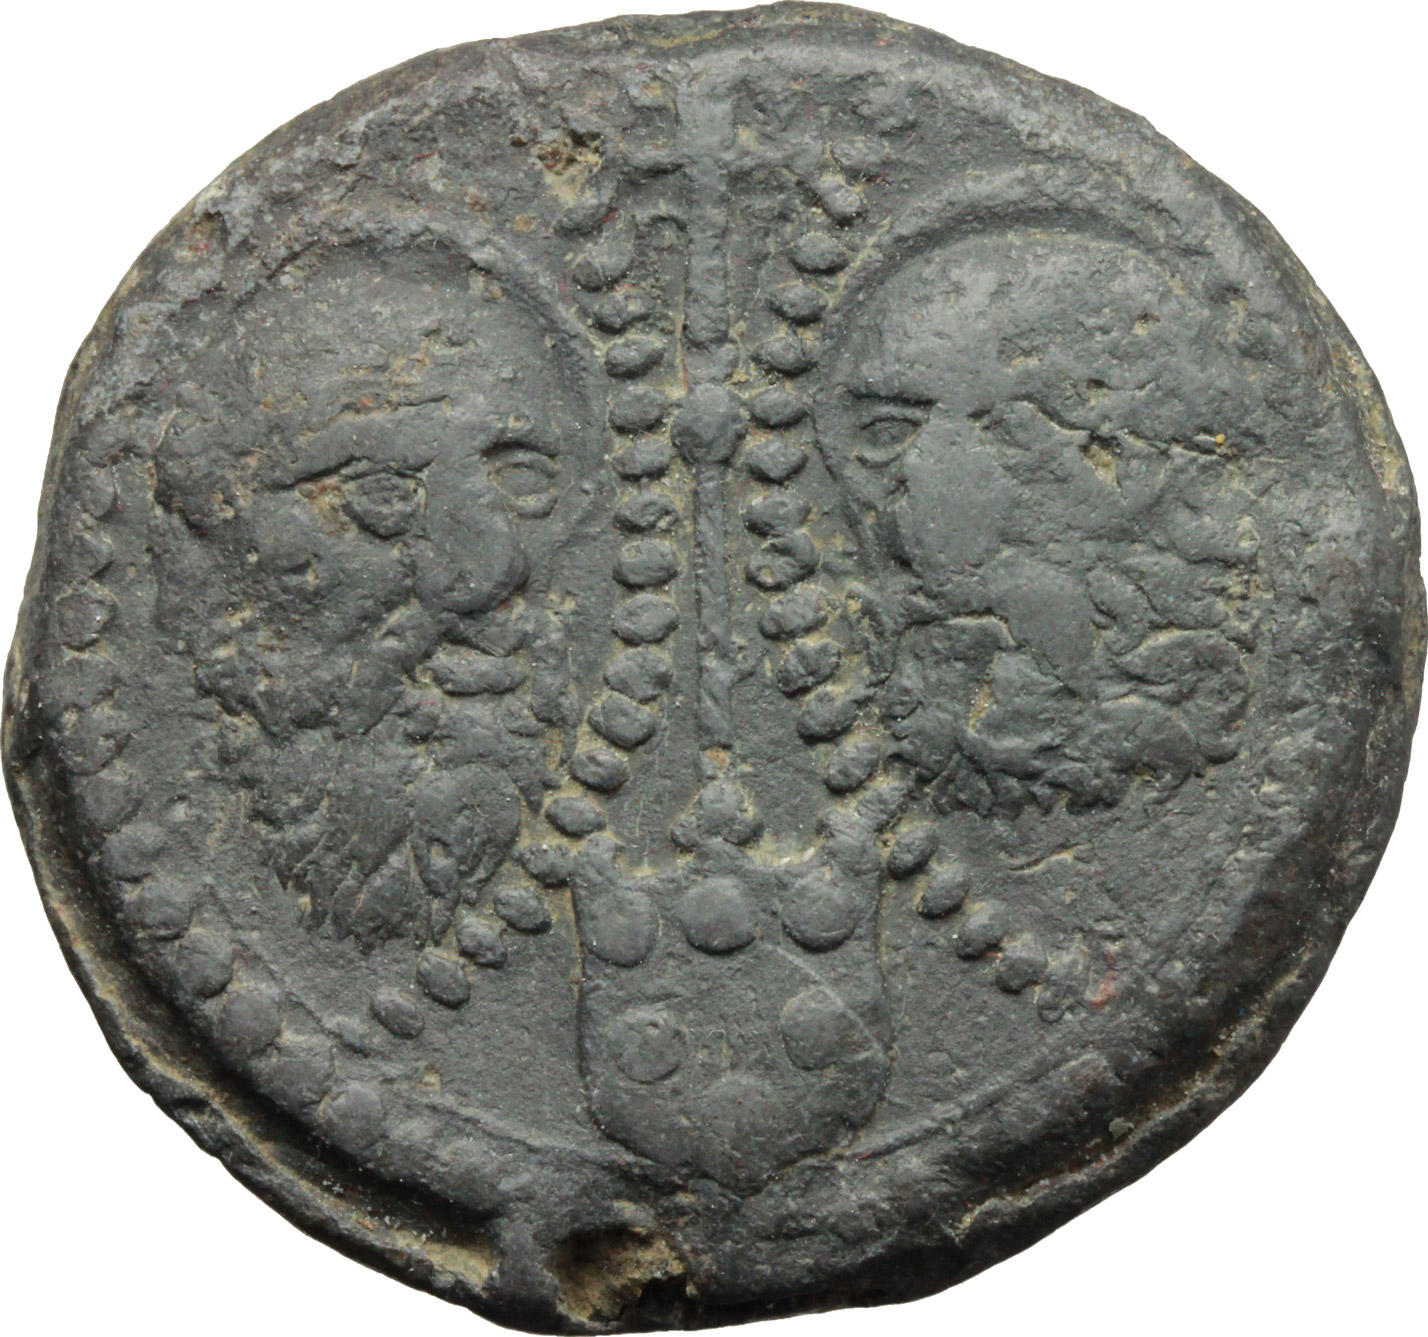 66fd768de9 Monete e Medaglie di Zecche Italiane (Page: 3) - Asta Numismatica 37E -  Artemide Aste - Dea Moneta